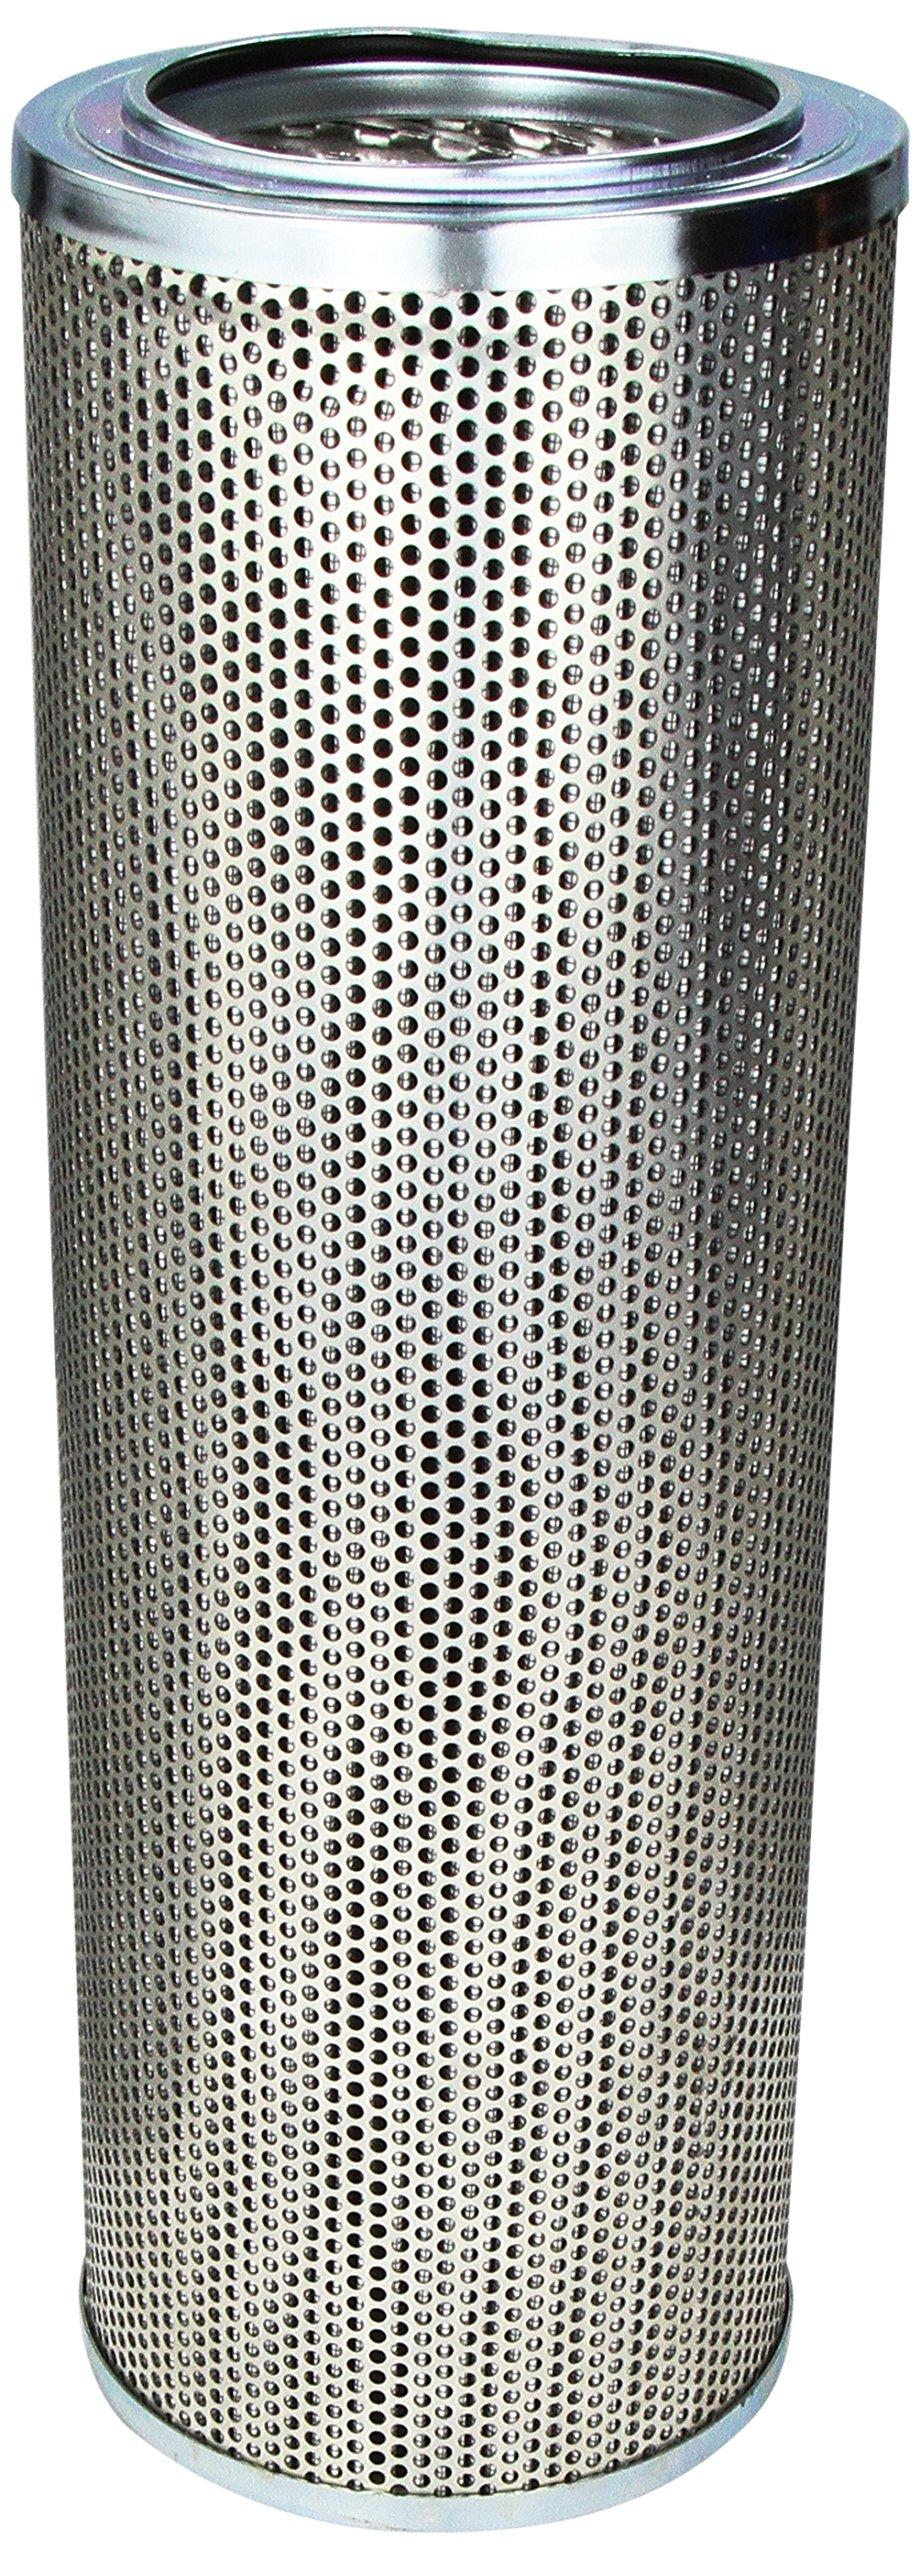 WIX Filters - 57896 Heavy Duty Cartridge Hydraulic Metal, Pack of 1